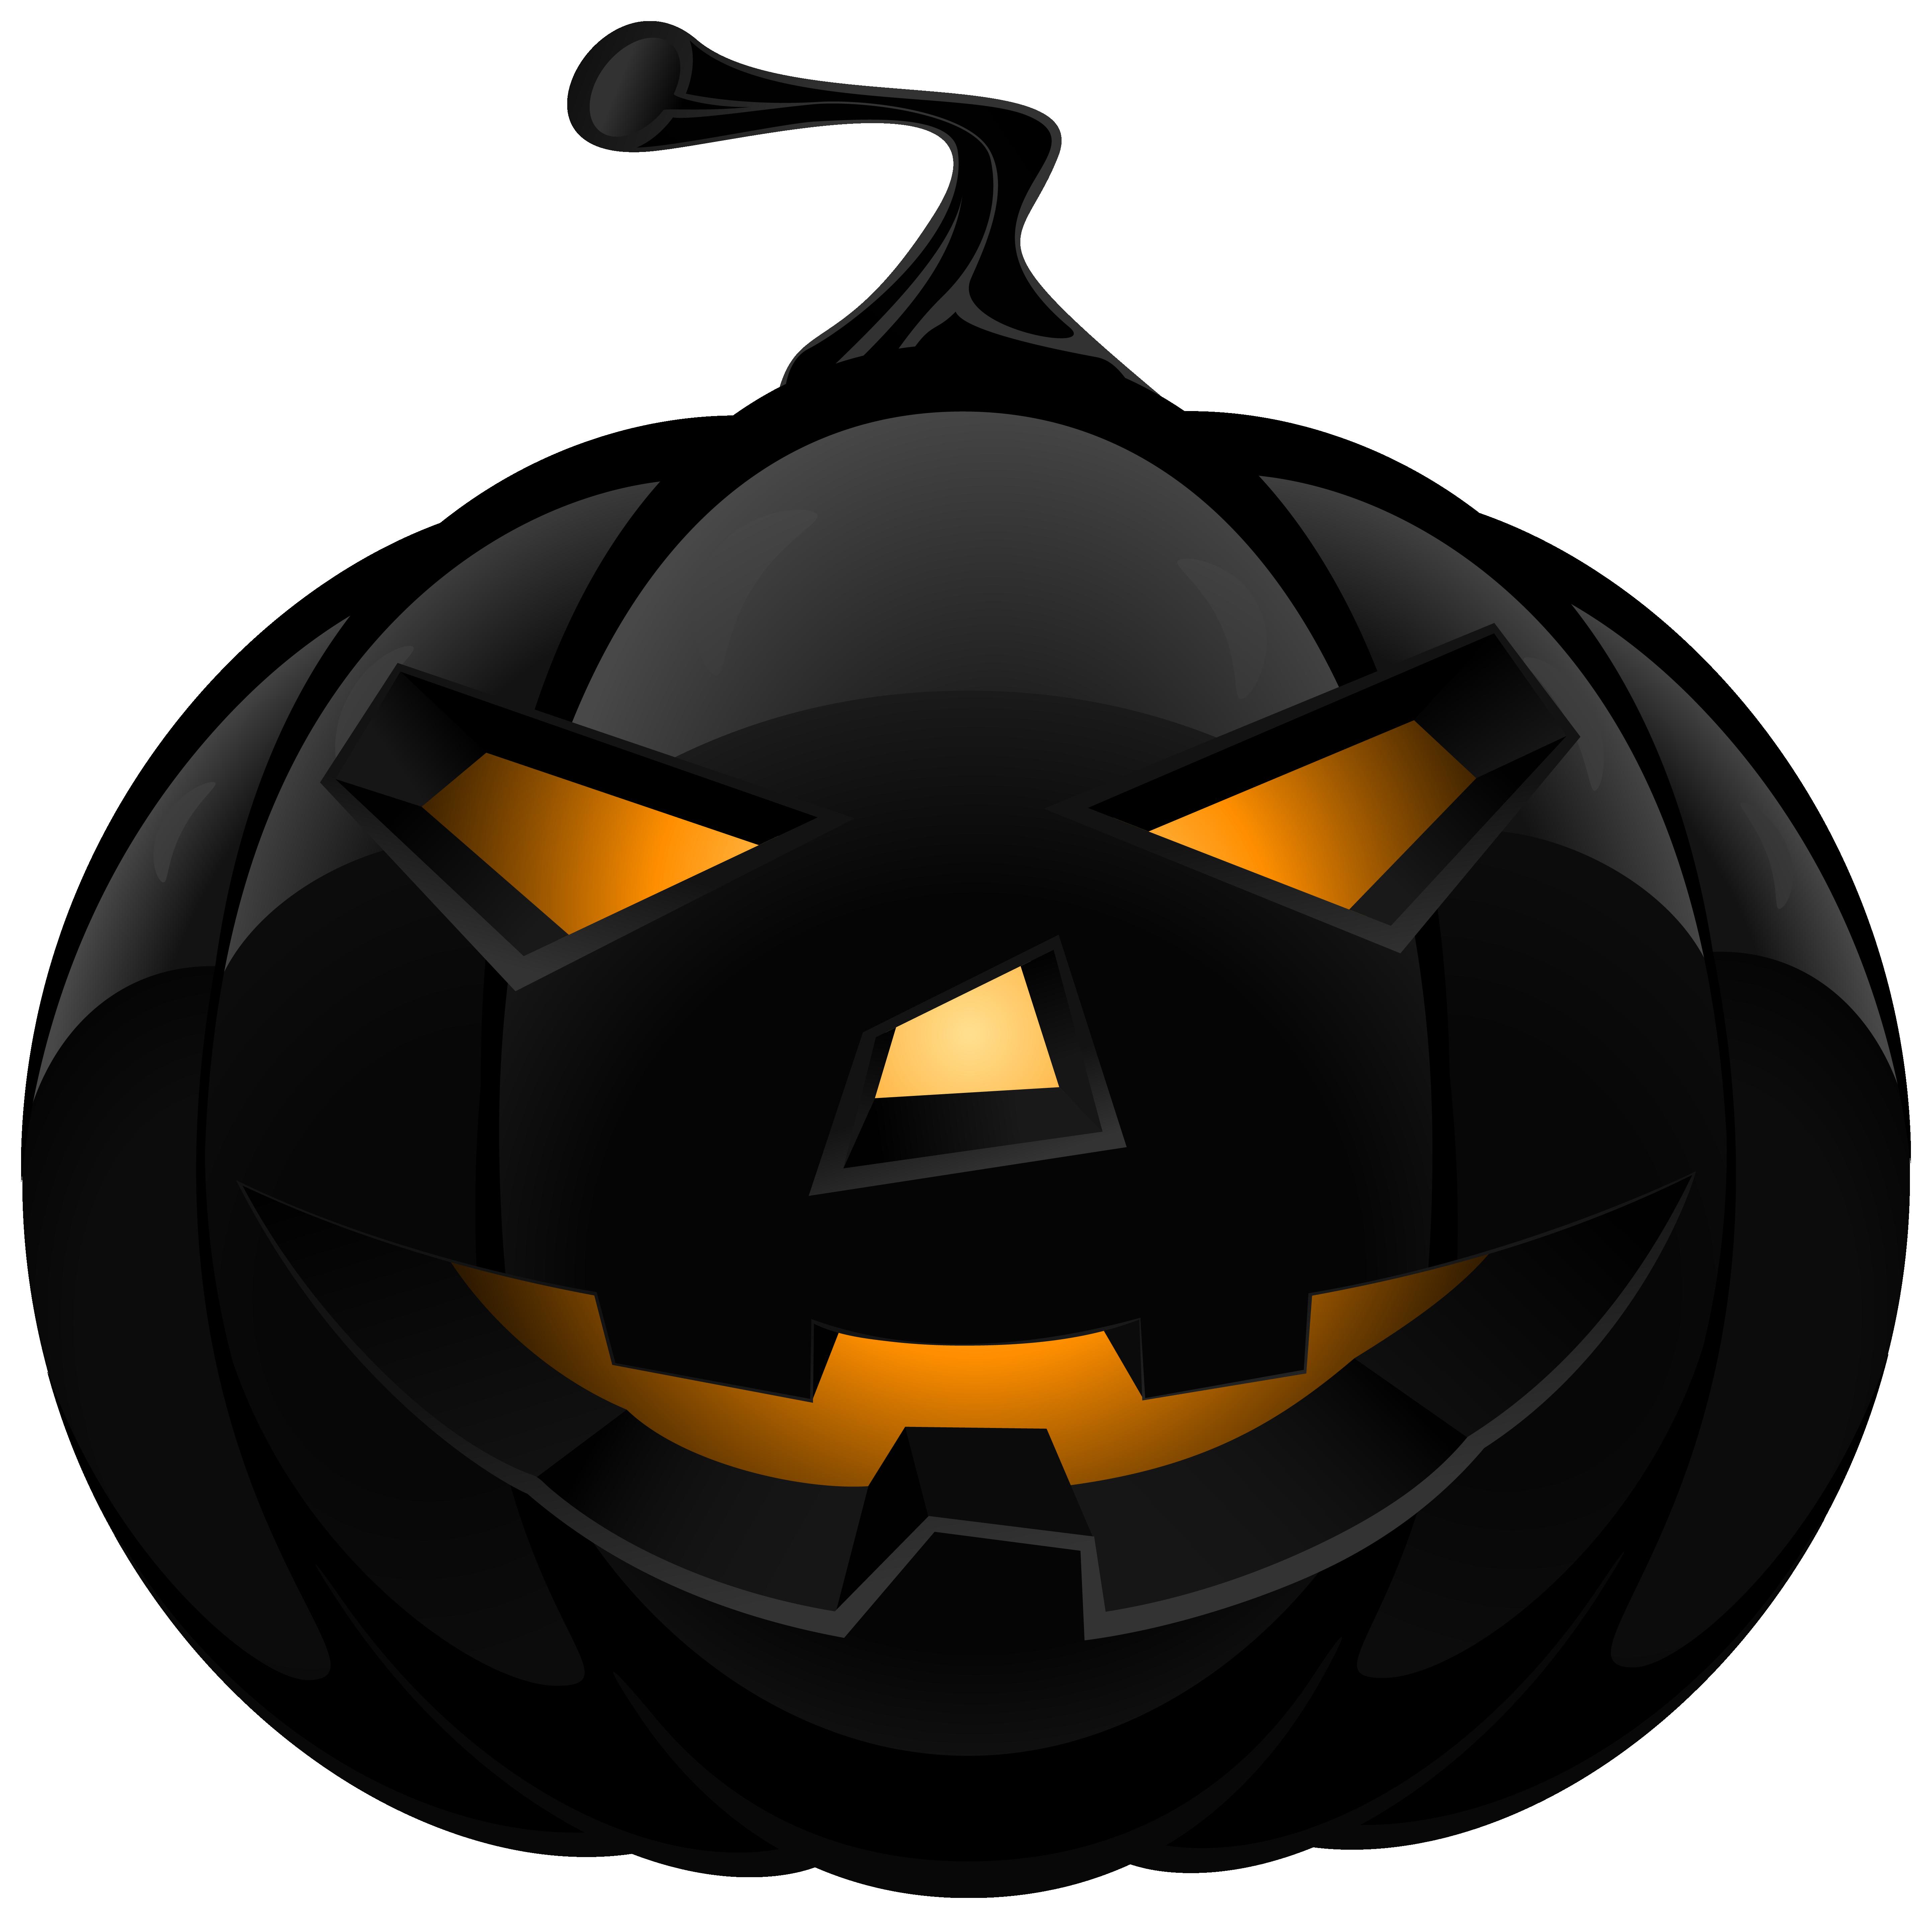 Clipart pumpkin lantern. Black png image gallery